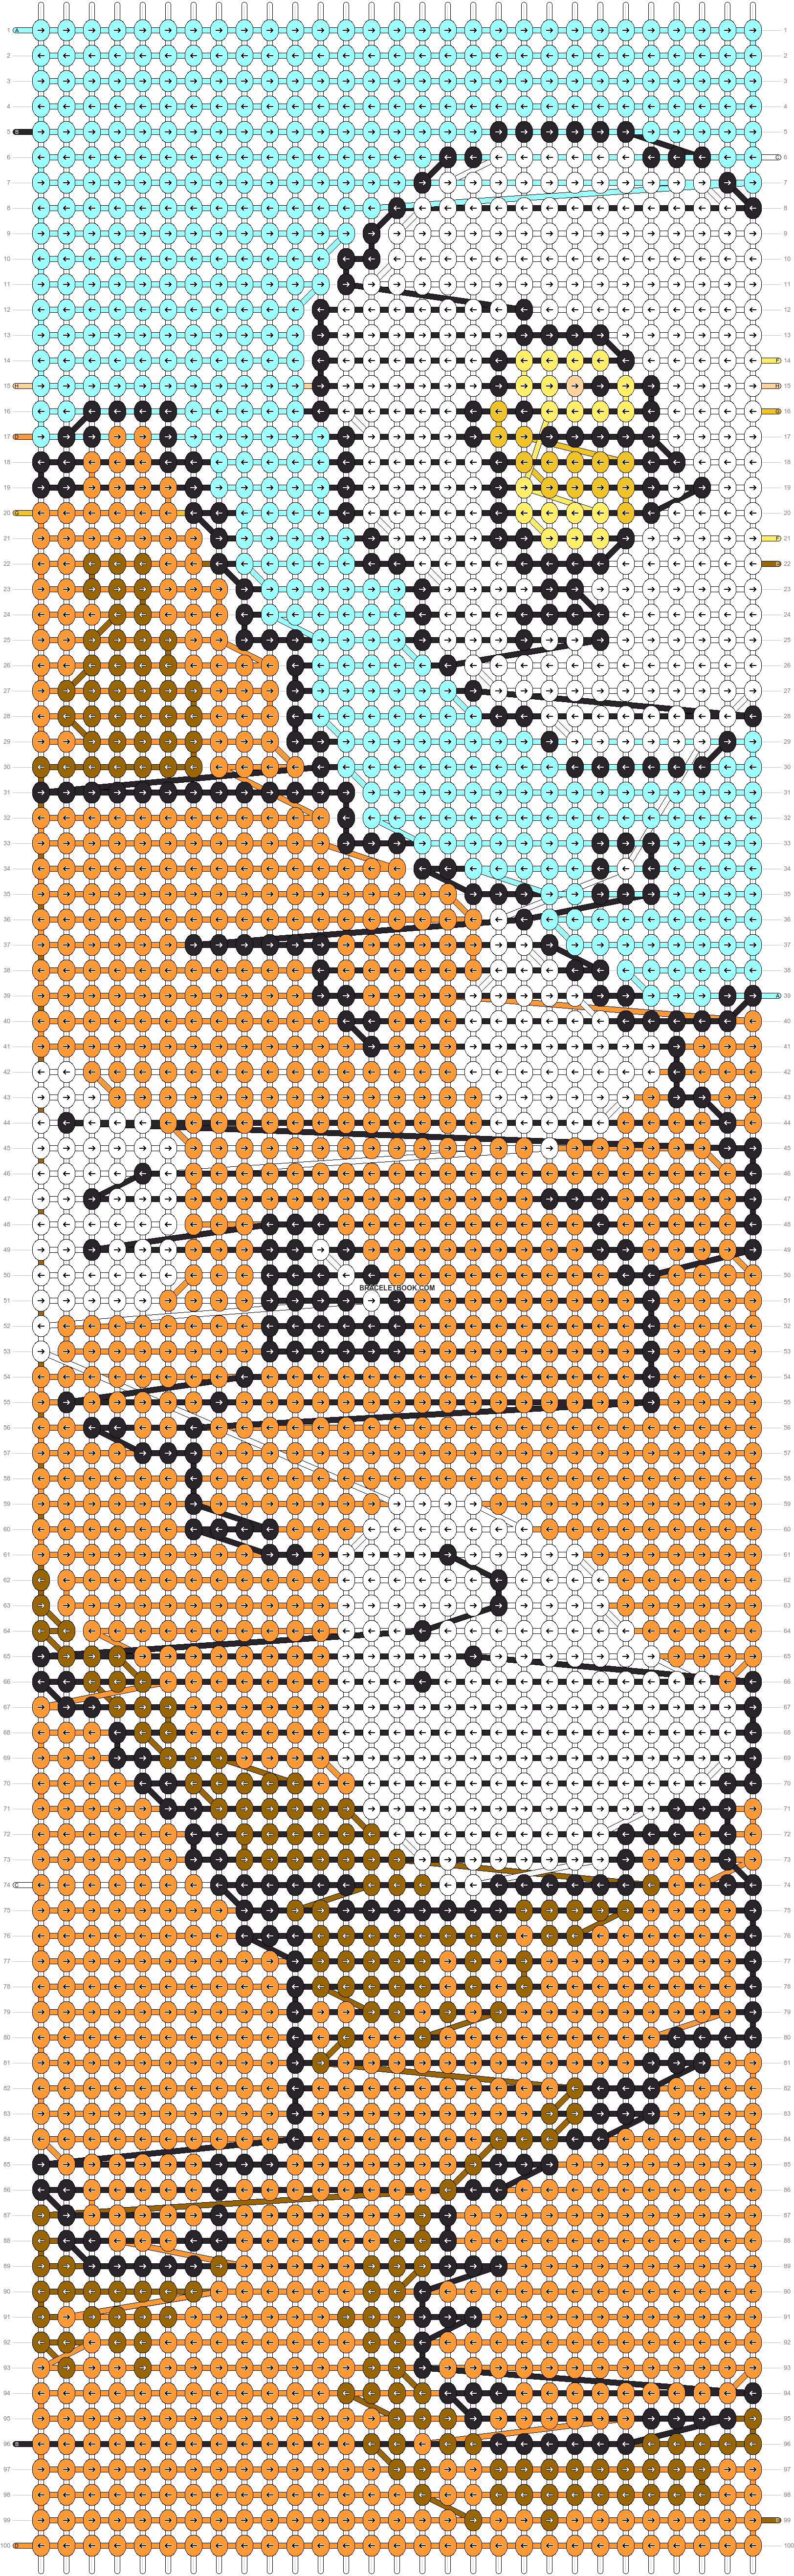 Alpha Pattern #9306 added by GalaxyCat